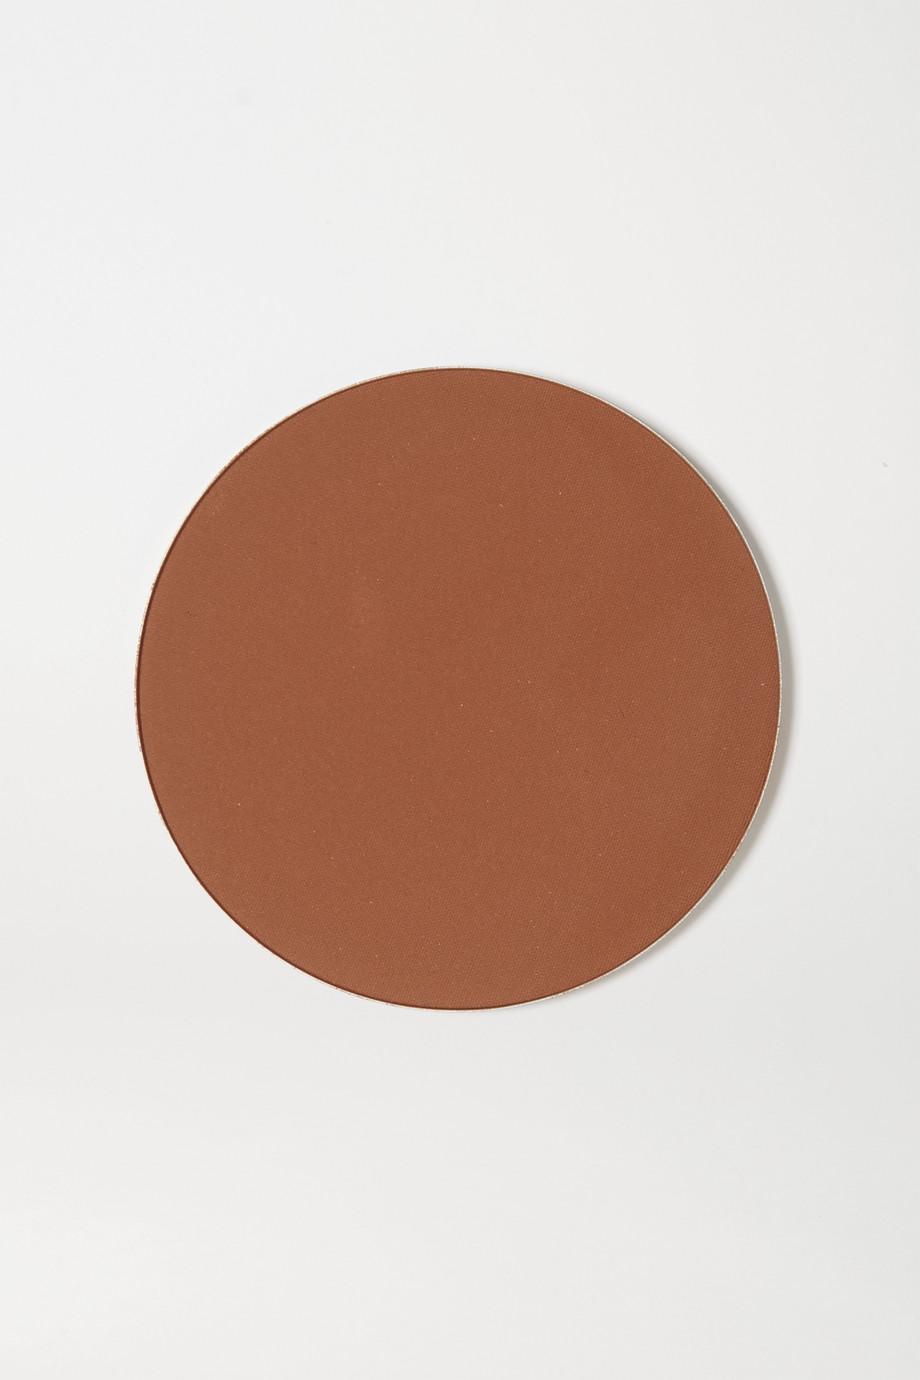 Charlotte Tilbury Airbrush Bronzer Refill - 3 Tan